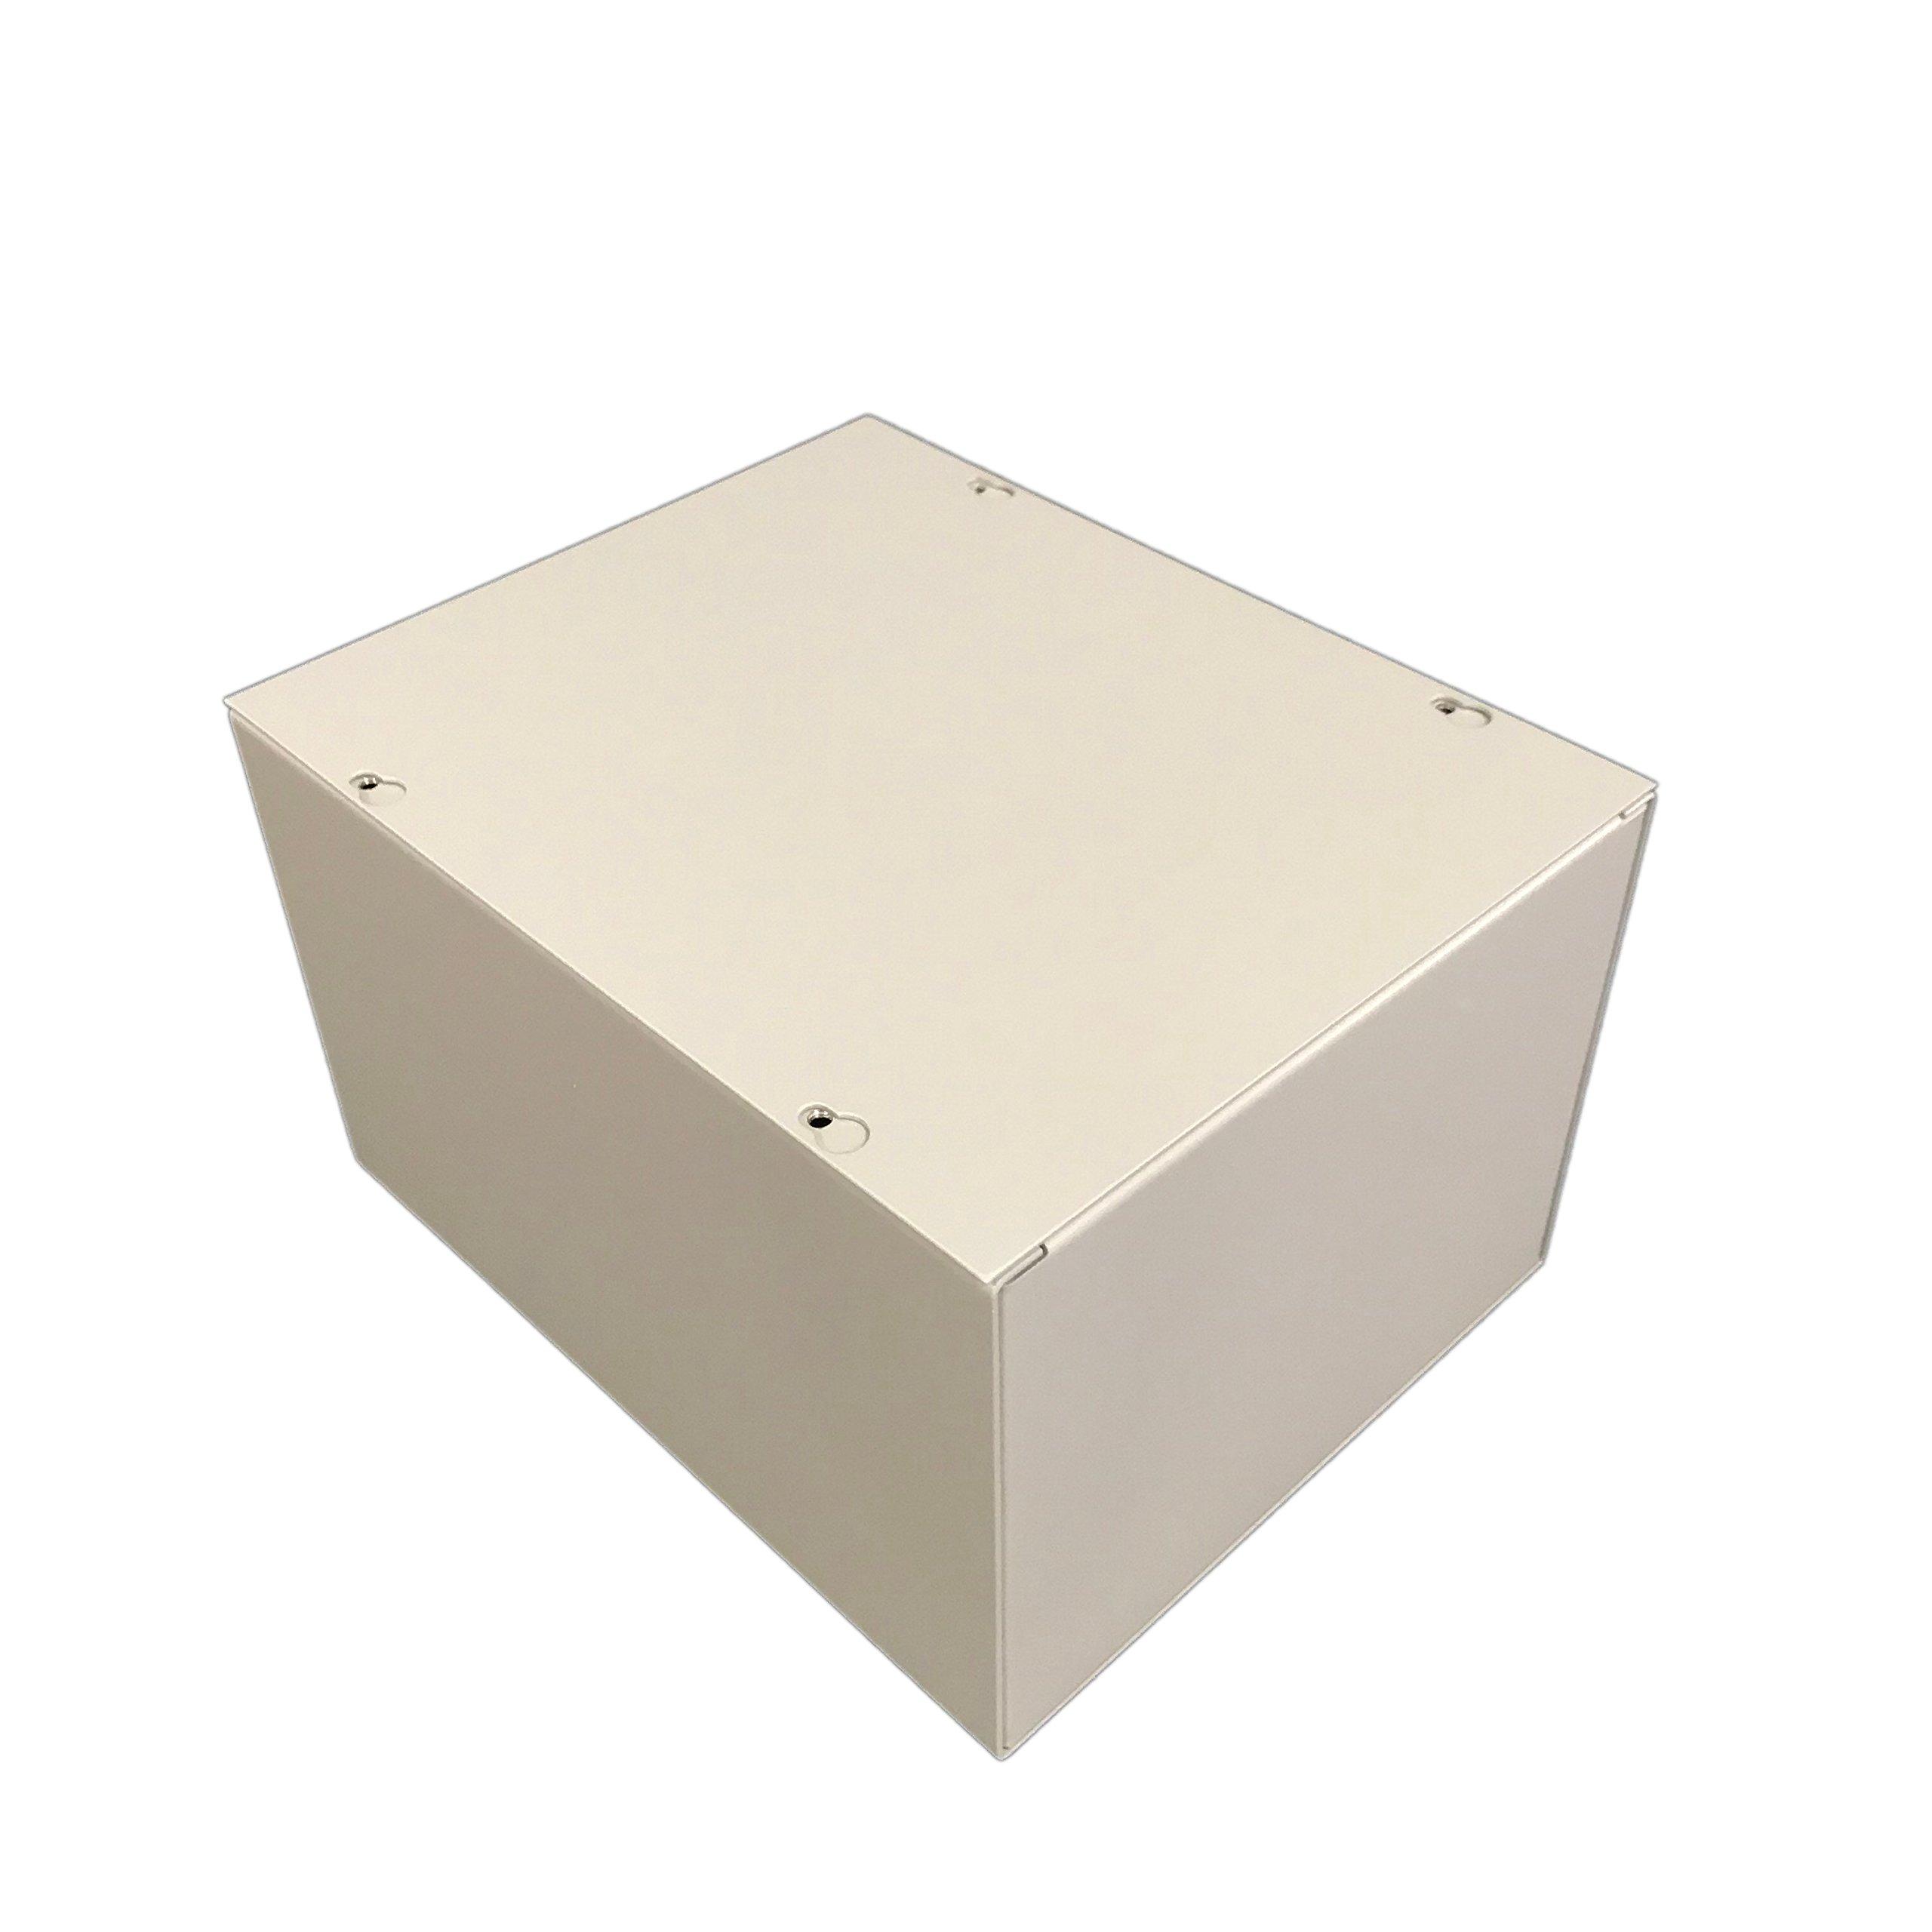 BUD Industries JB-3959 Steel NEMA 1 Sheet Metal Junction Box with Lift-off Screw Cover, 8'' Width x 10'' Height x 6'' Depth, Gray Finish